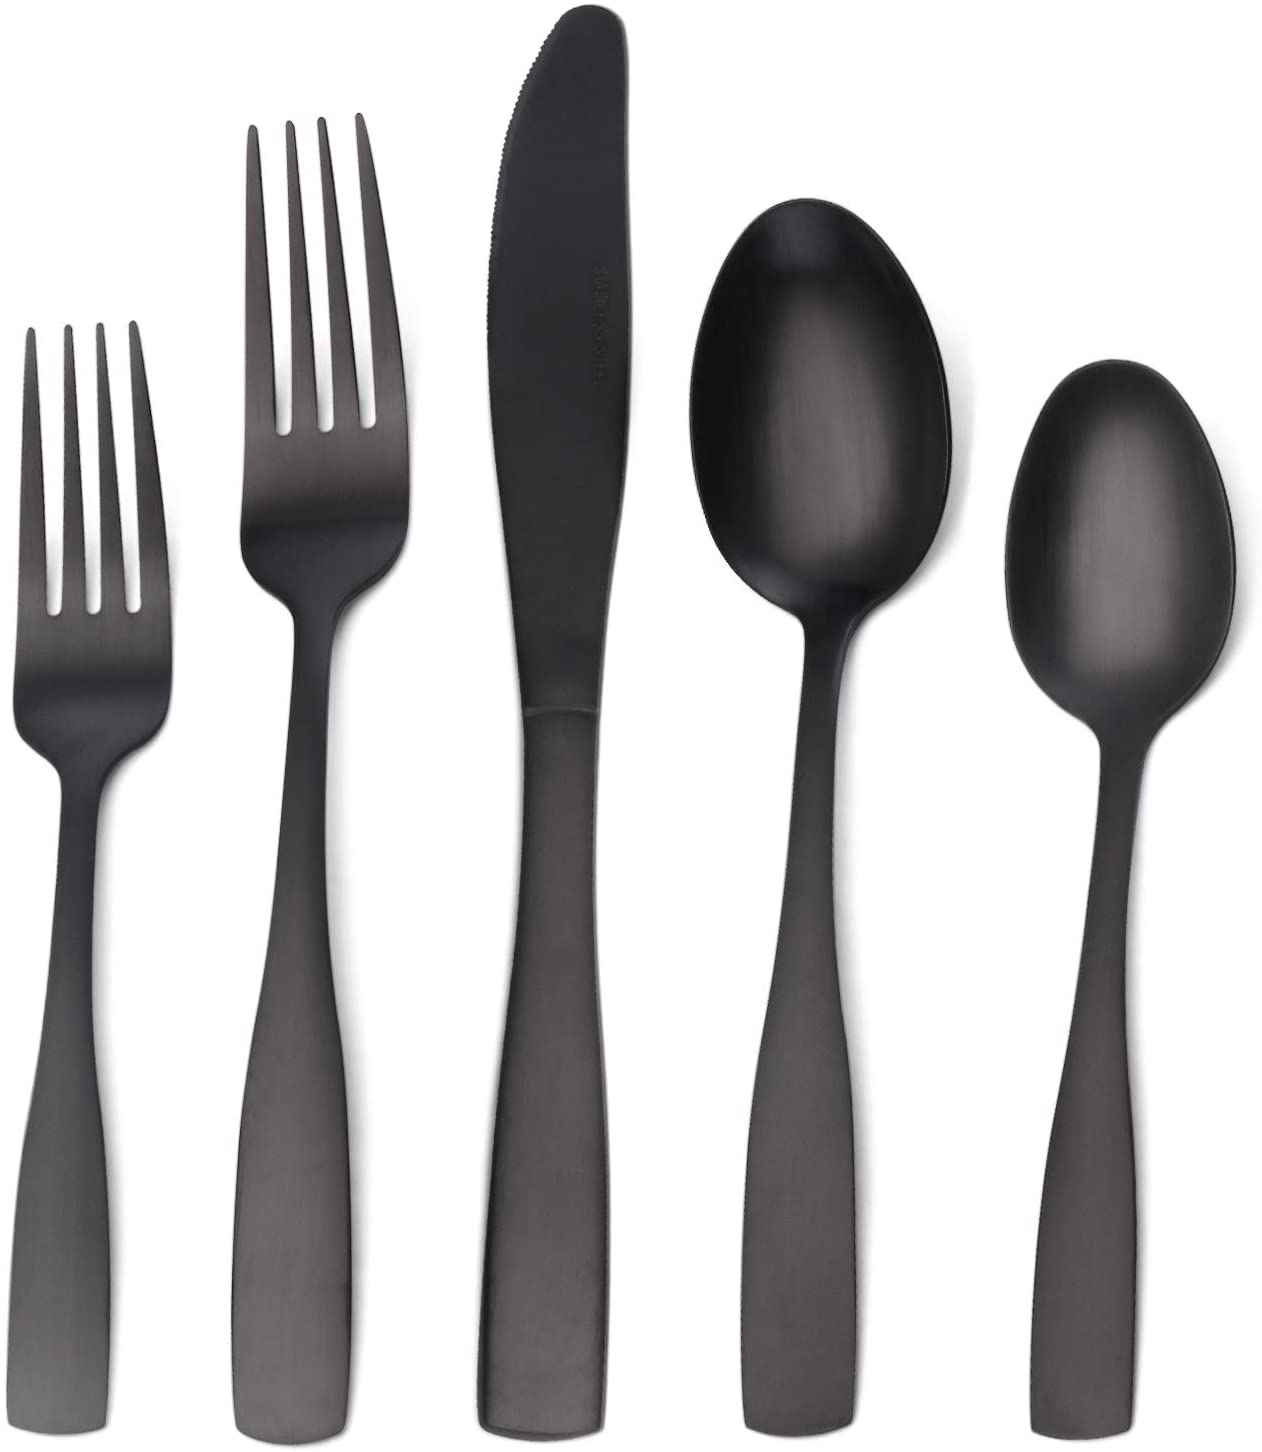 O.C.E Matte Black Stainless-Steel Silverware Set